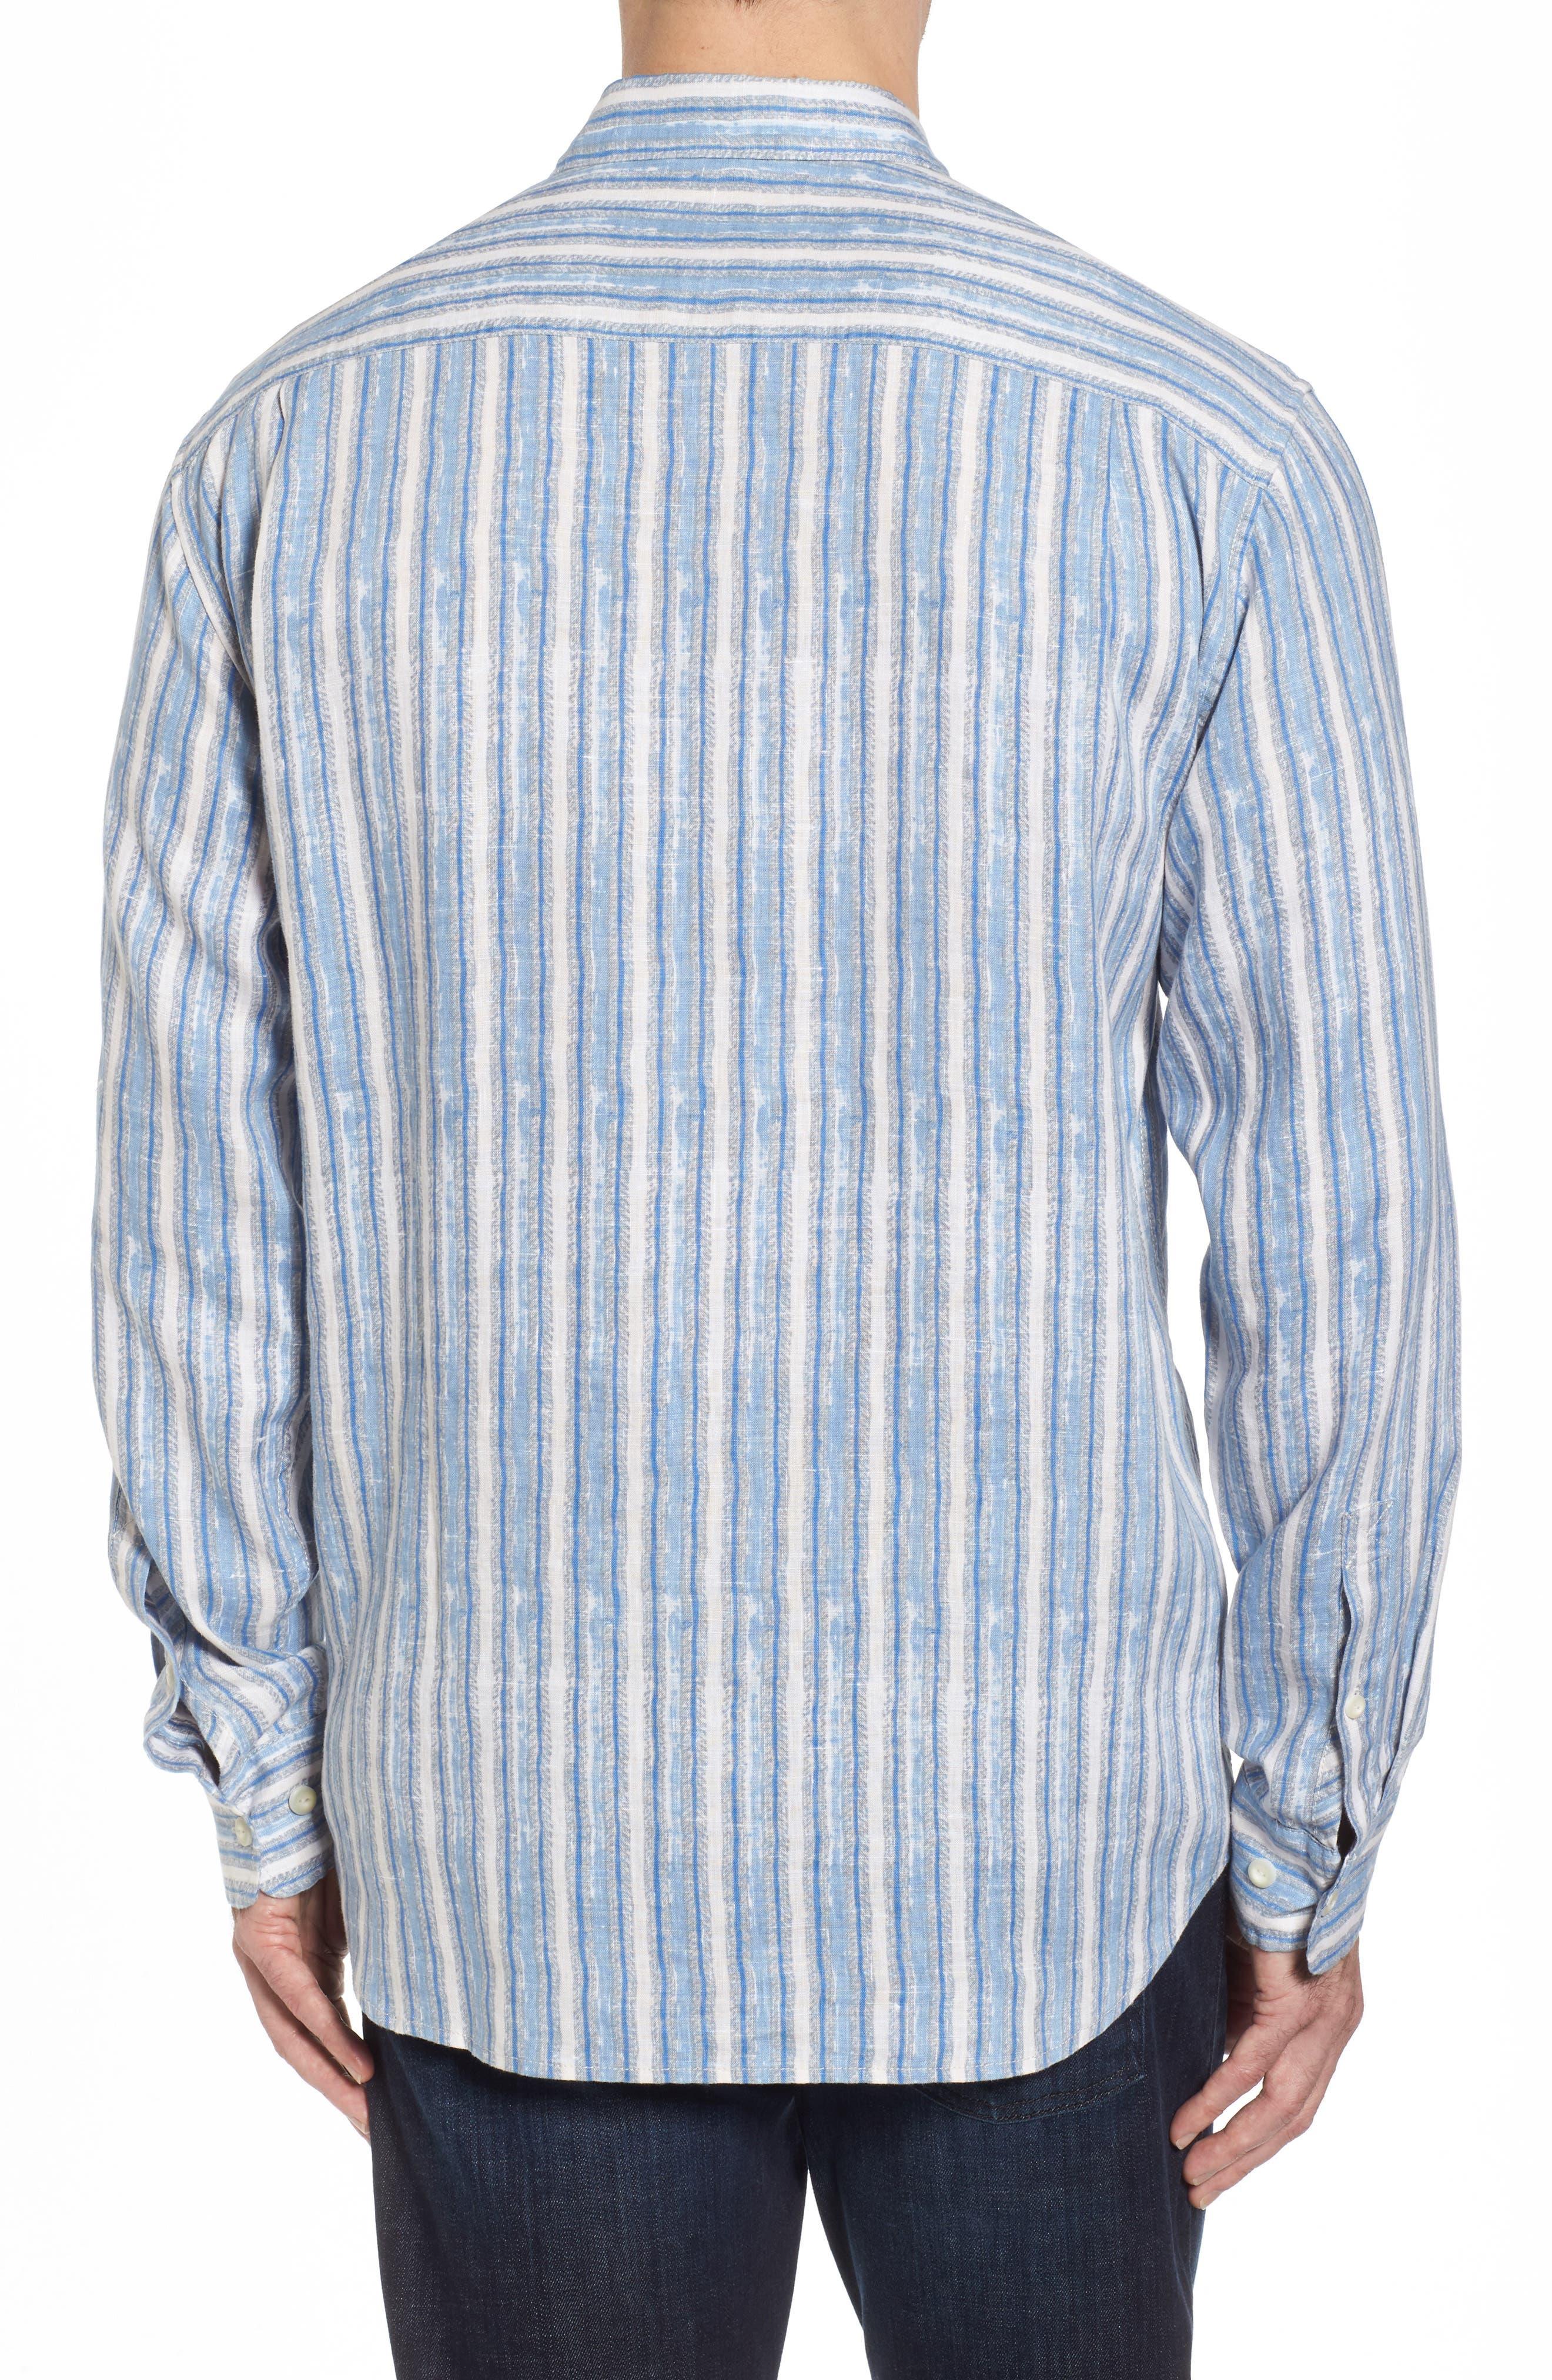 Along Shore Stripe Linen Sport Shirt,                             Alternate thumbnail 2, color,                             400